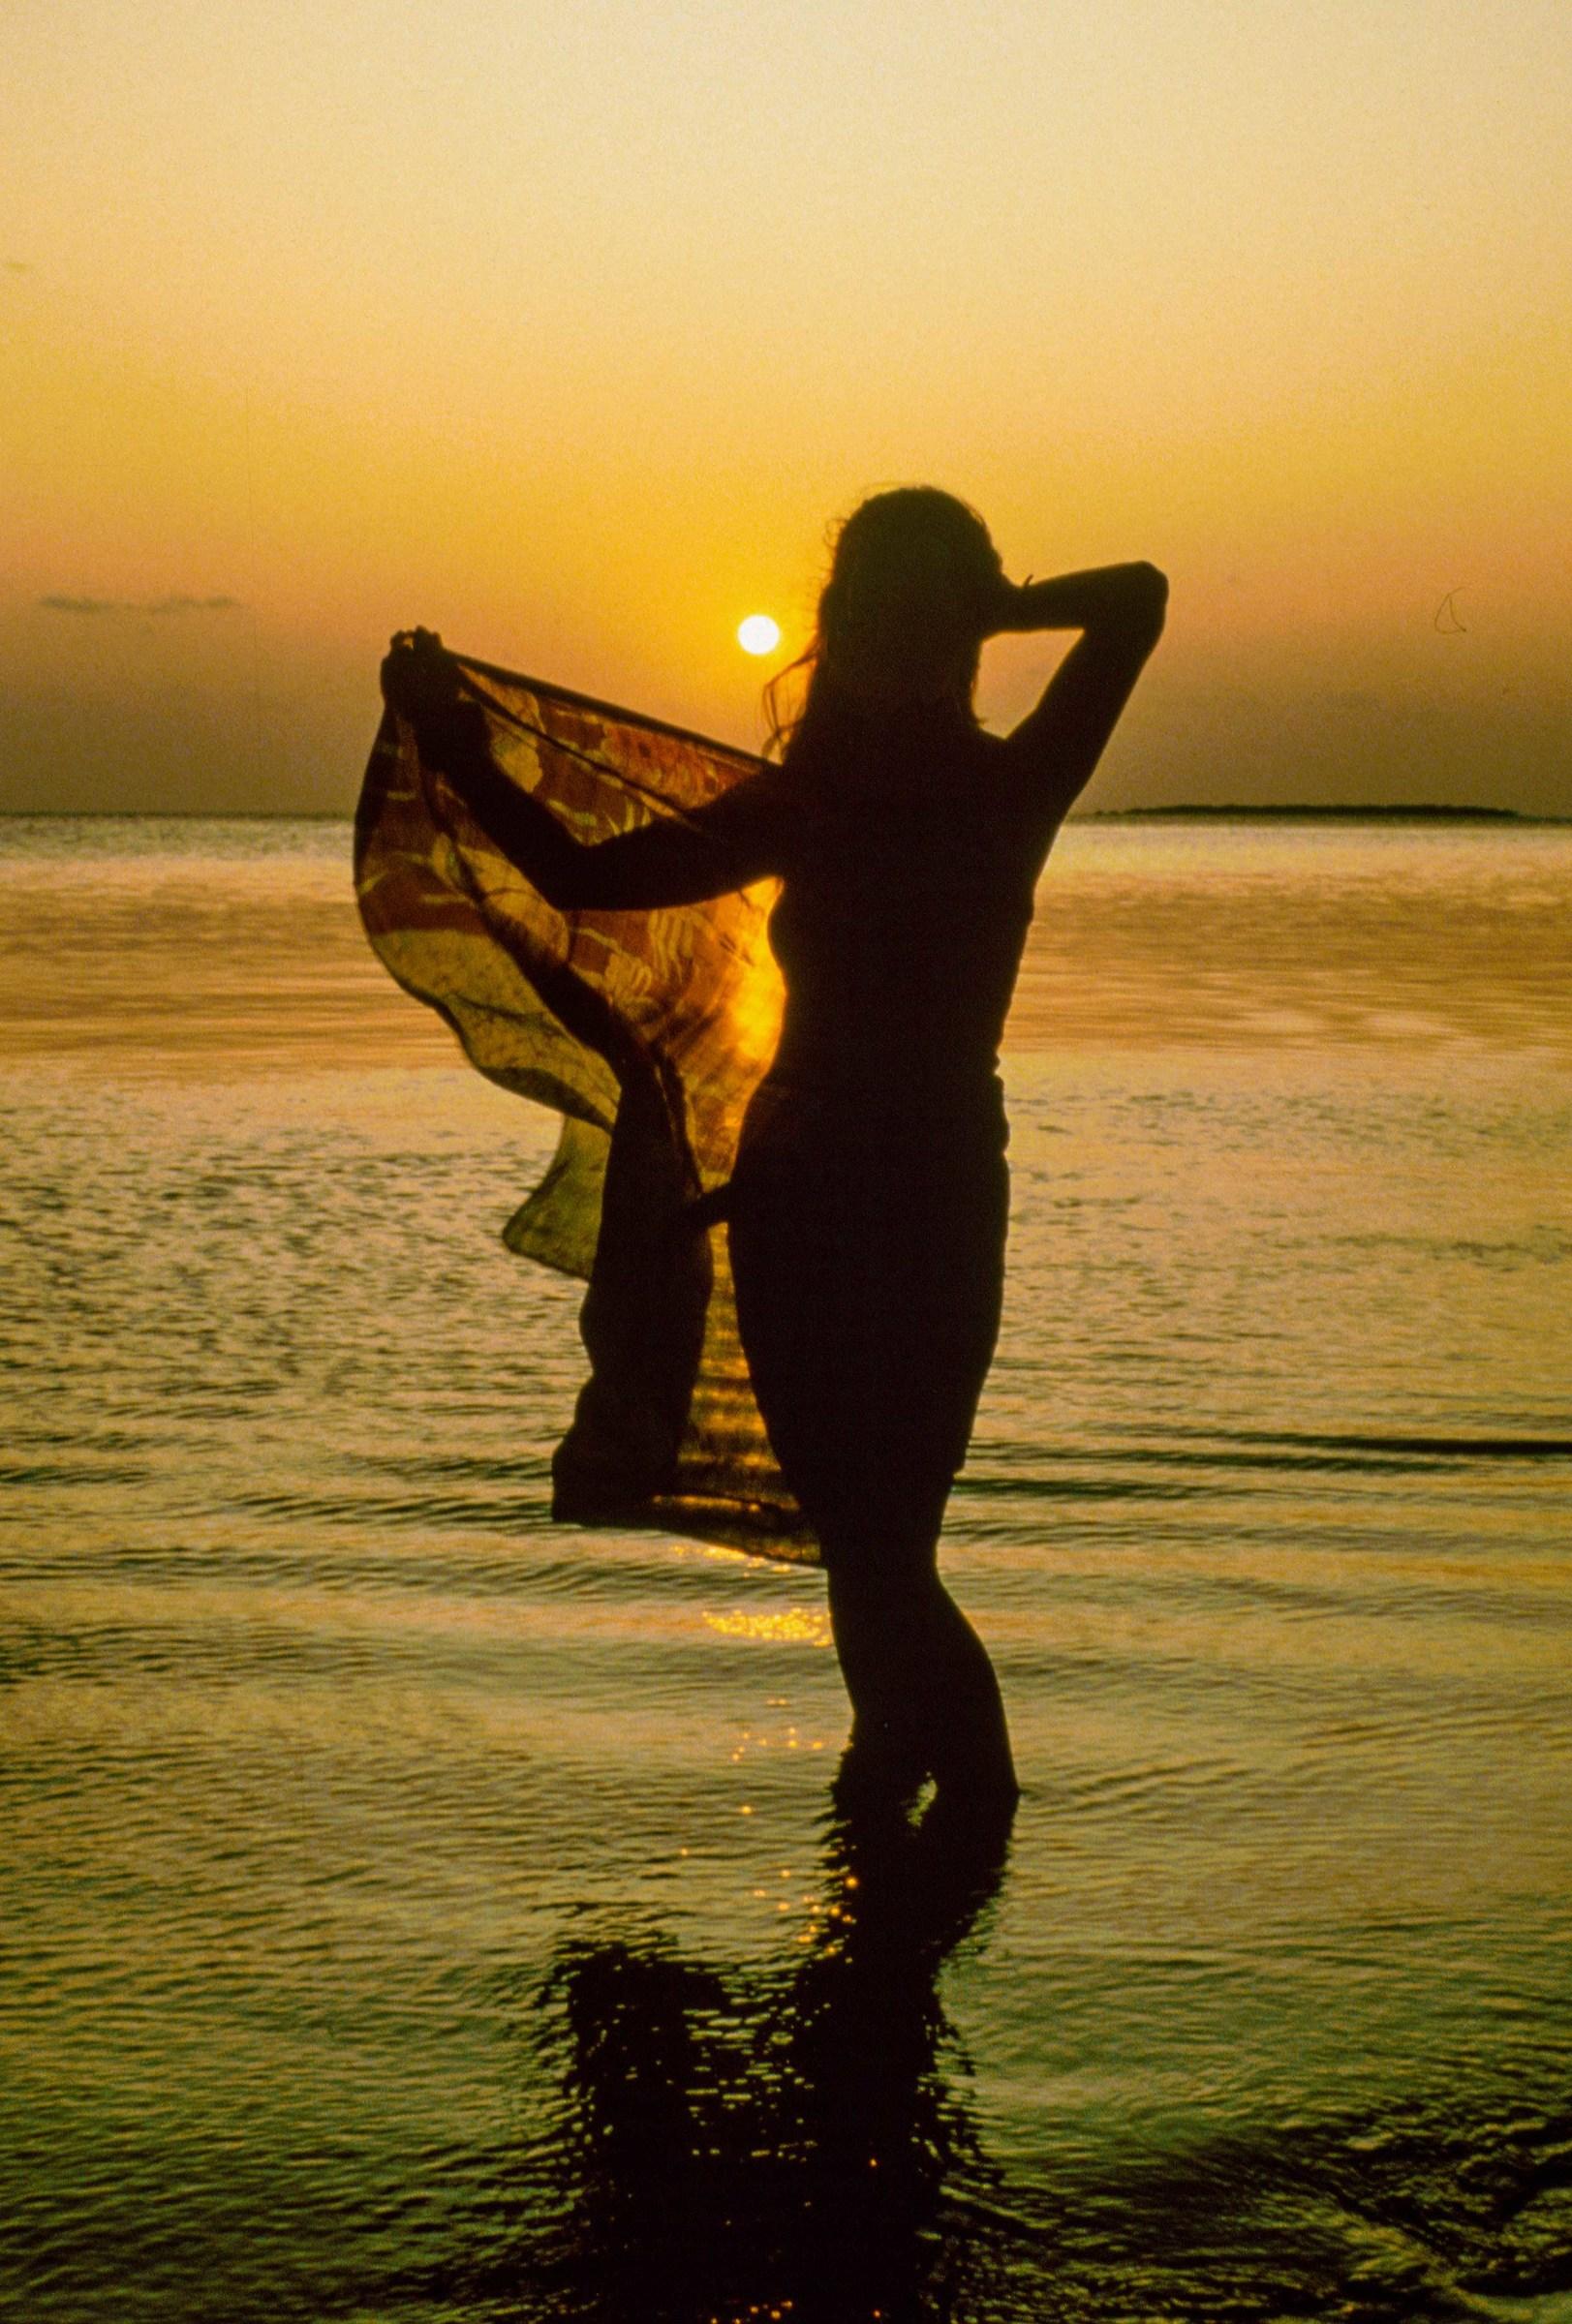 Sunset at the Maldives...